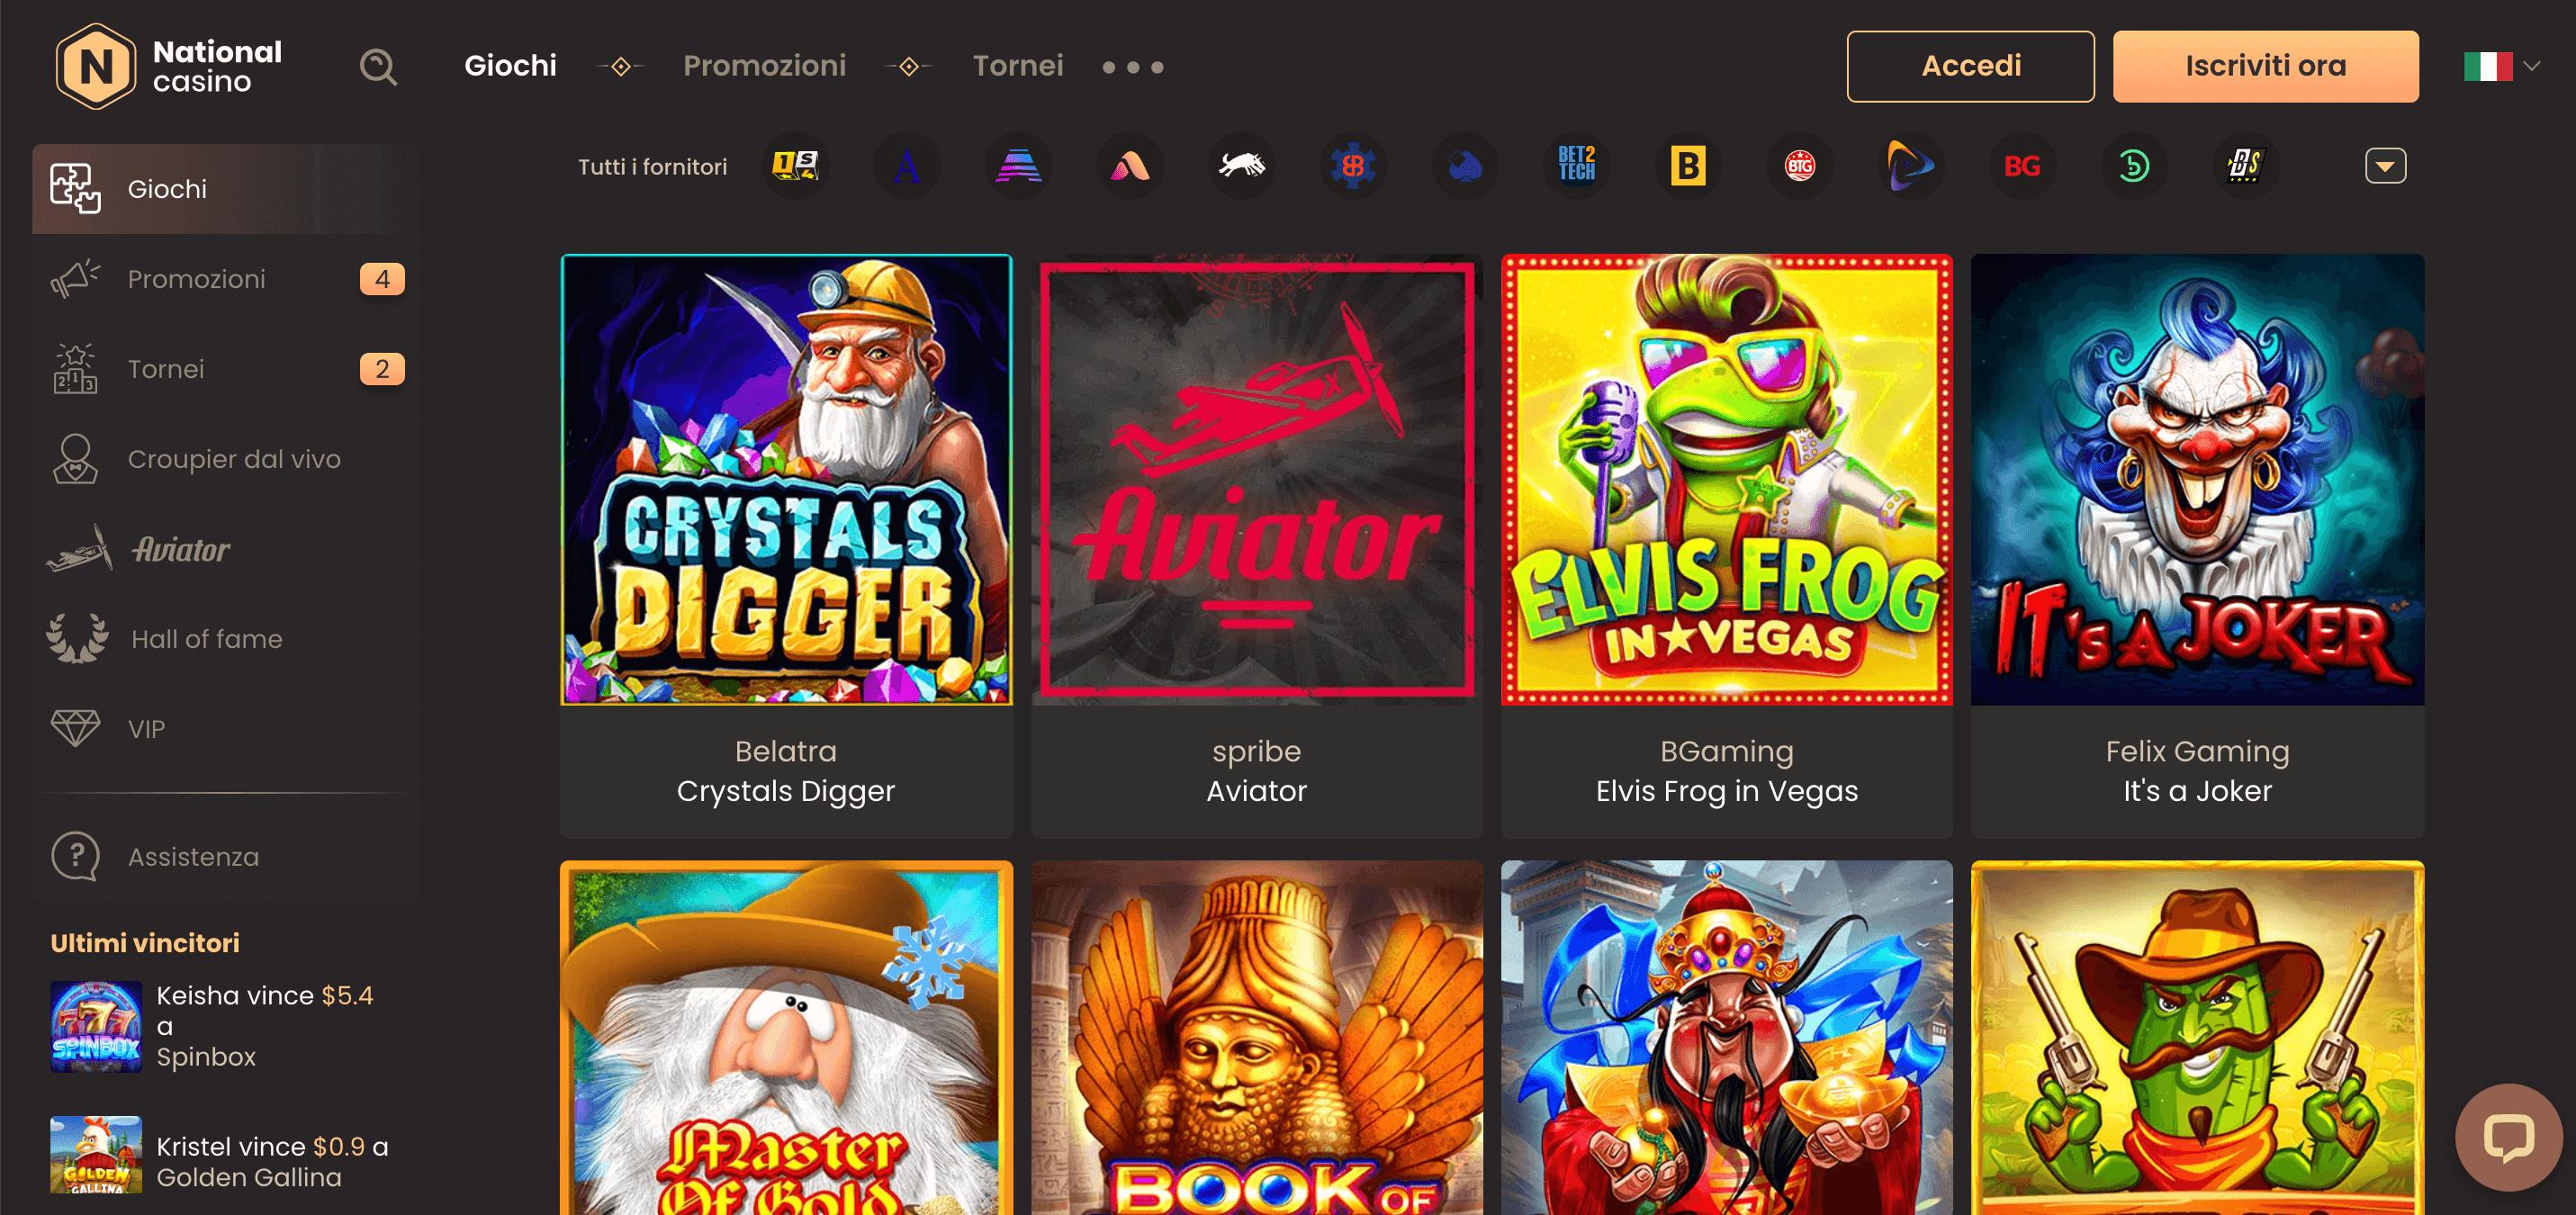 National Casino Slot